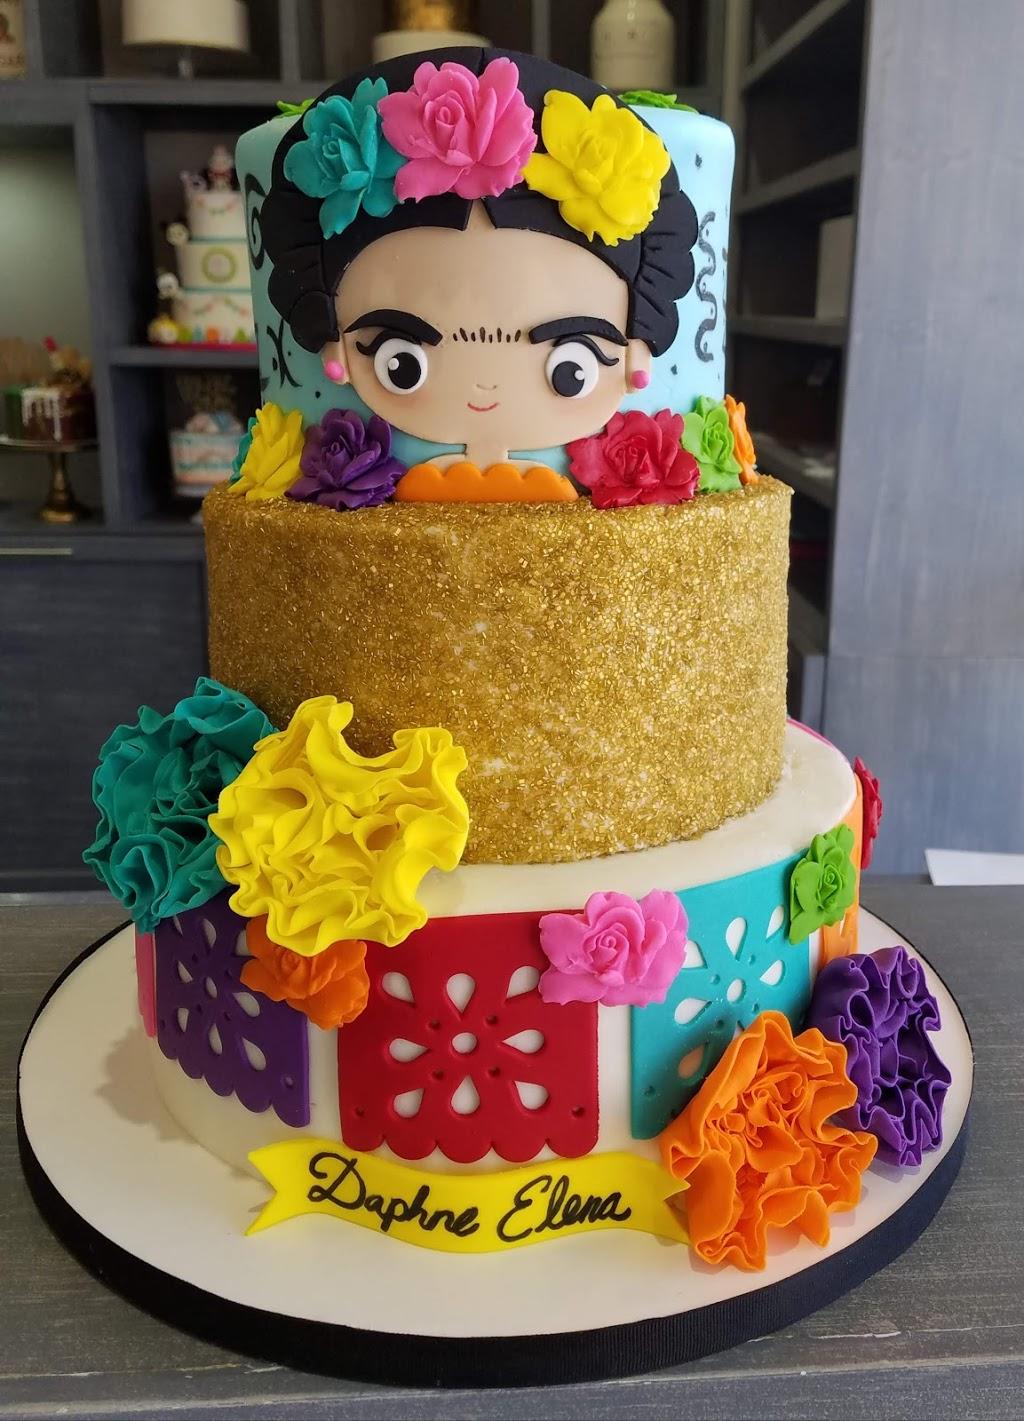 Cakes By Design - bakery    Photo 6 of 8   Address: 5517 McPherson Rd # 10, Laredo, TX 78041, USA   Phone: (956) 791-5712